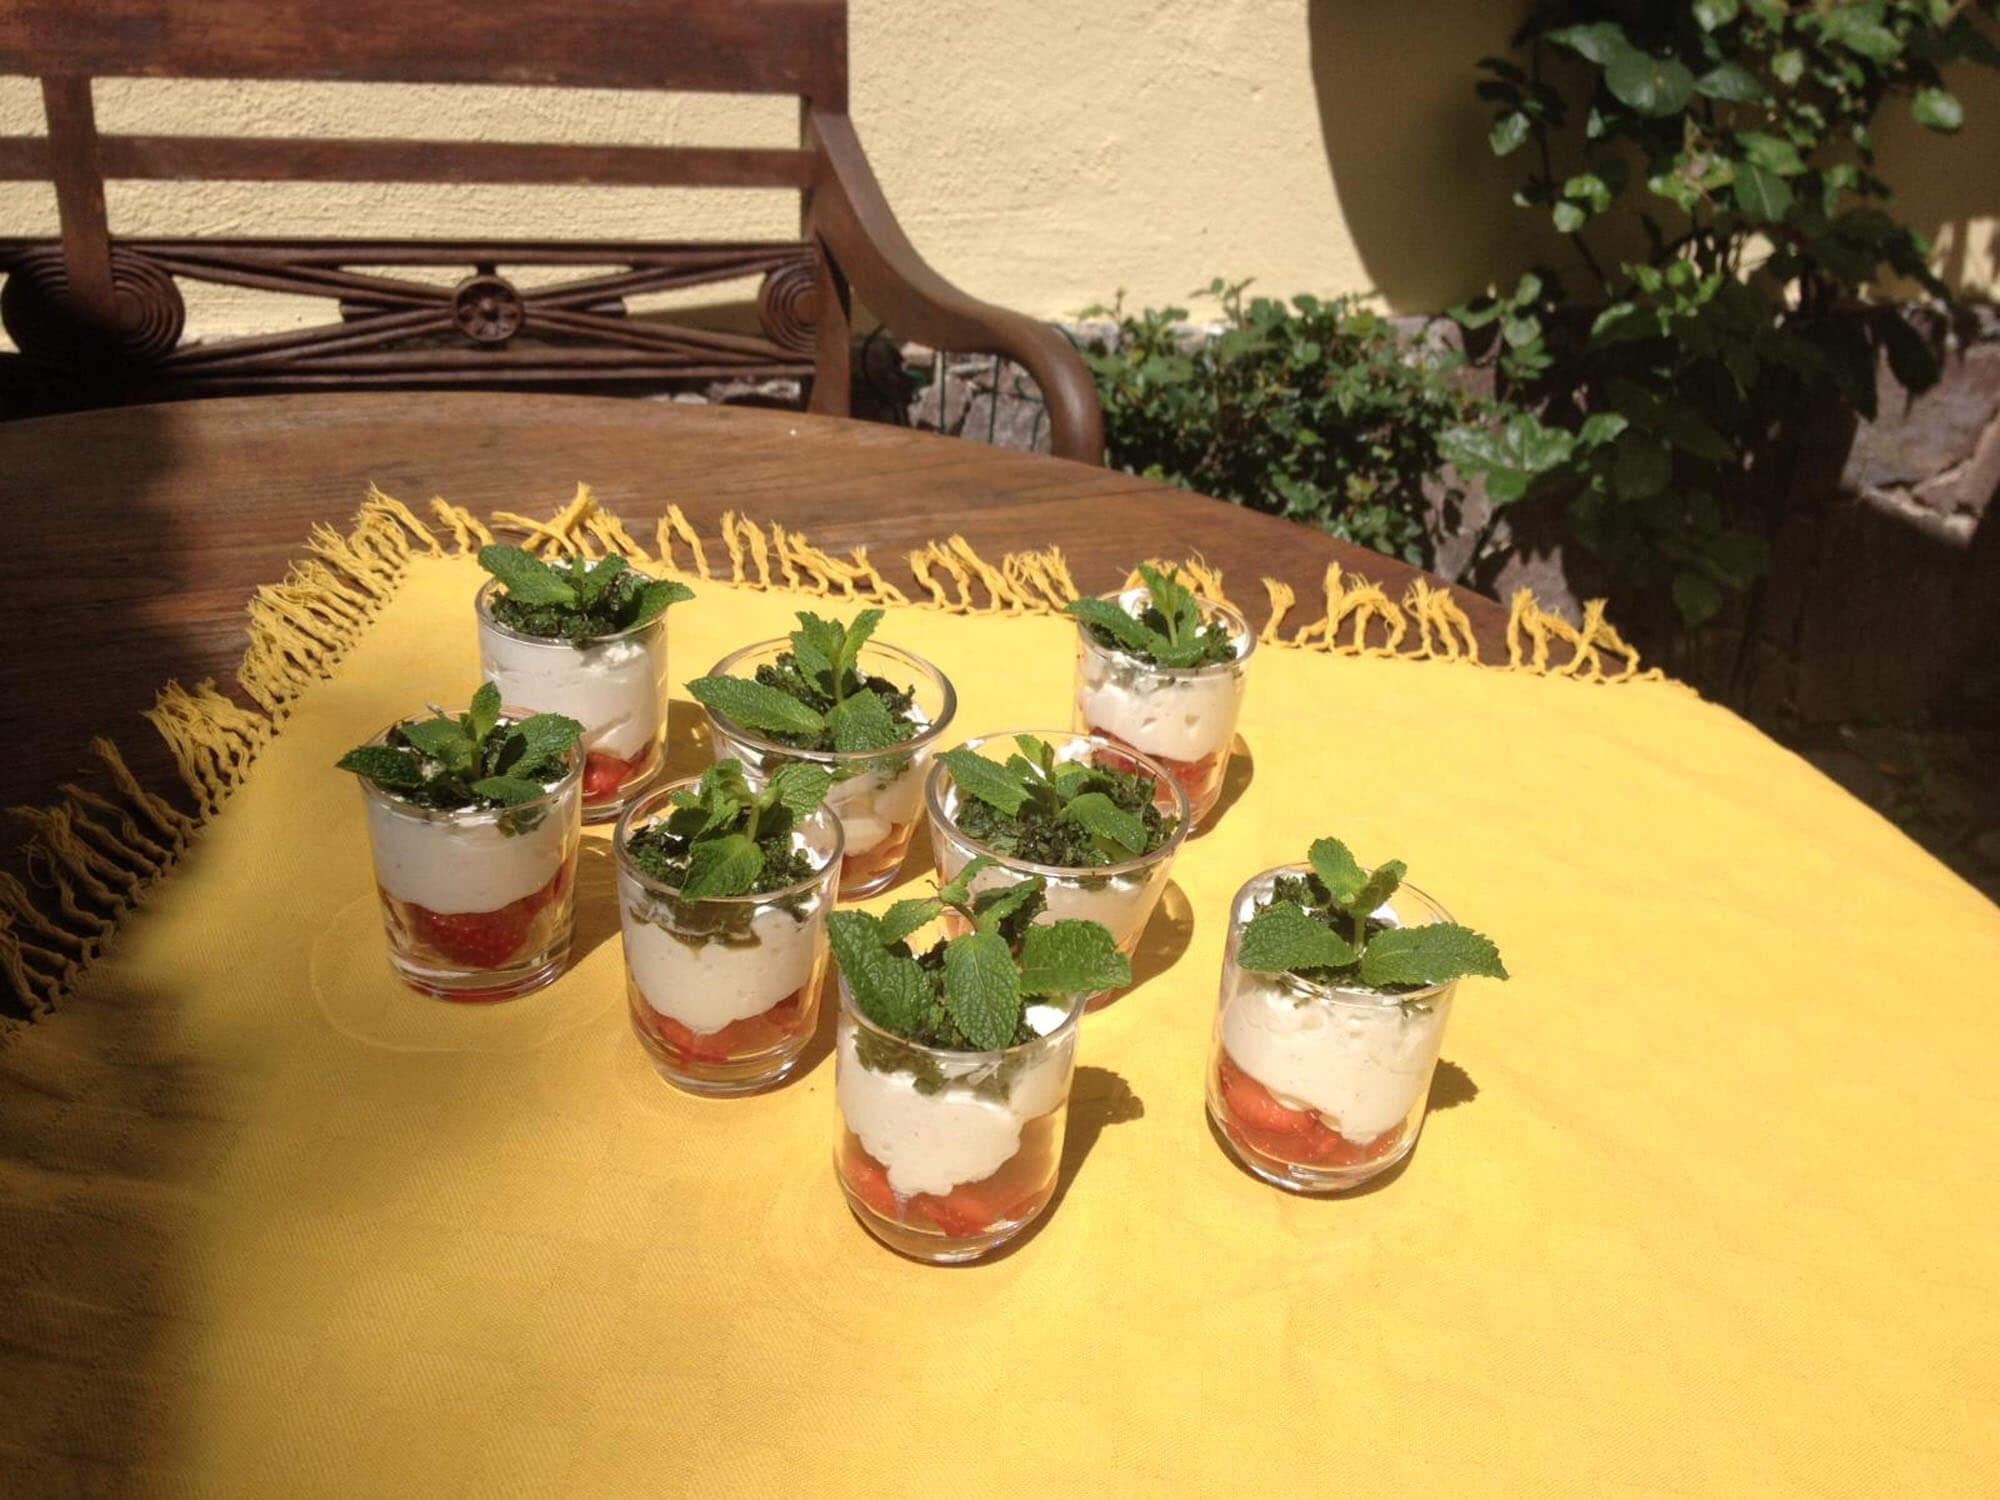 02a Erdbeer-Mascarpone_Kulturbuntes Bodenheim #tagdernachbarn